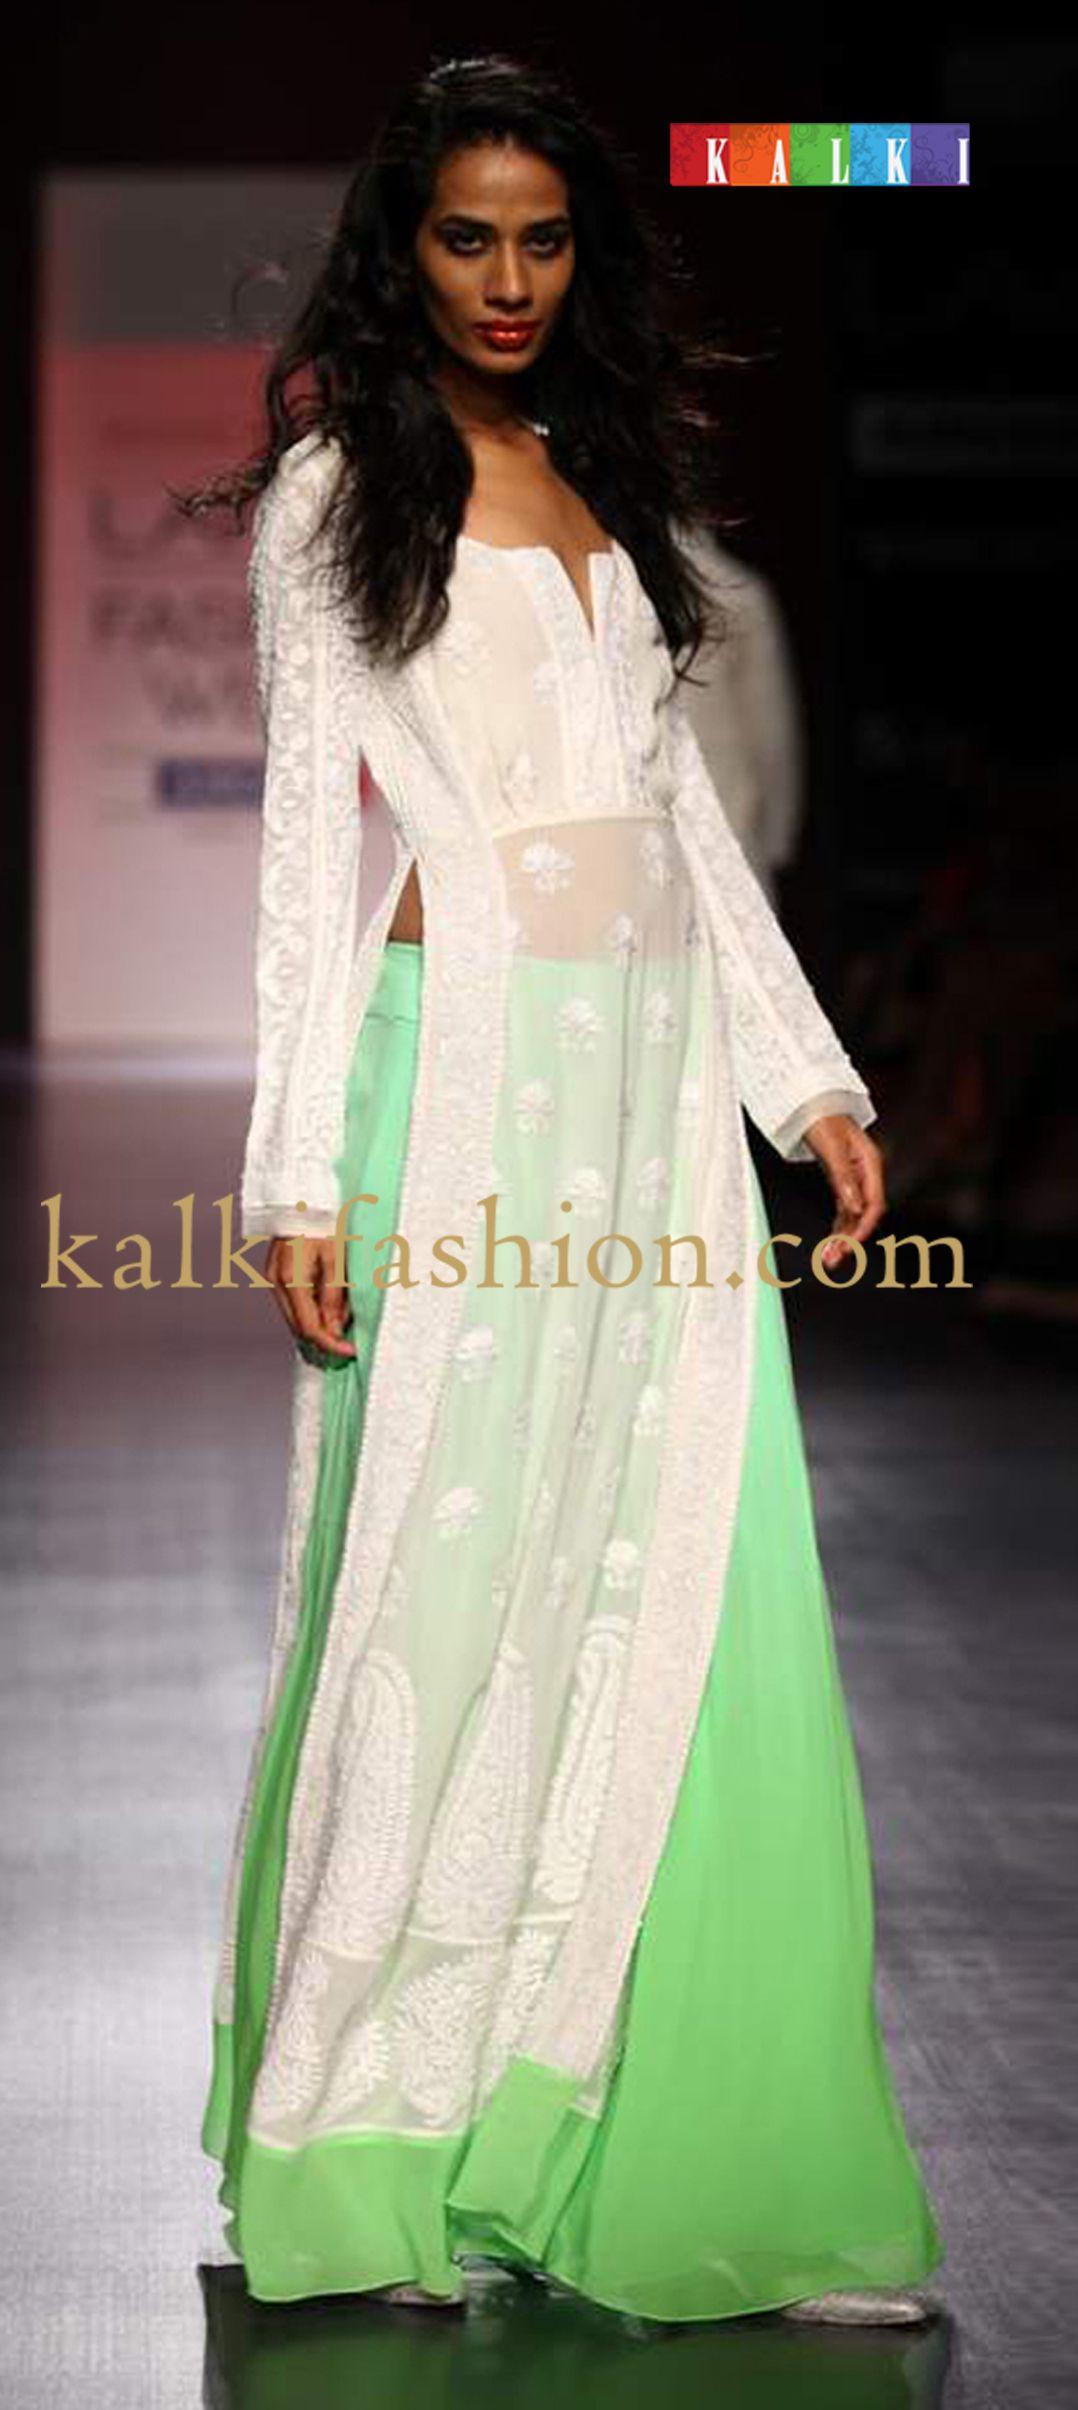 Pin by rachana patel on indian wear pinterest manish malhotra